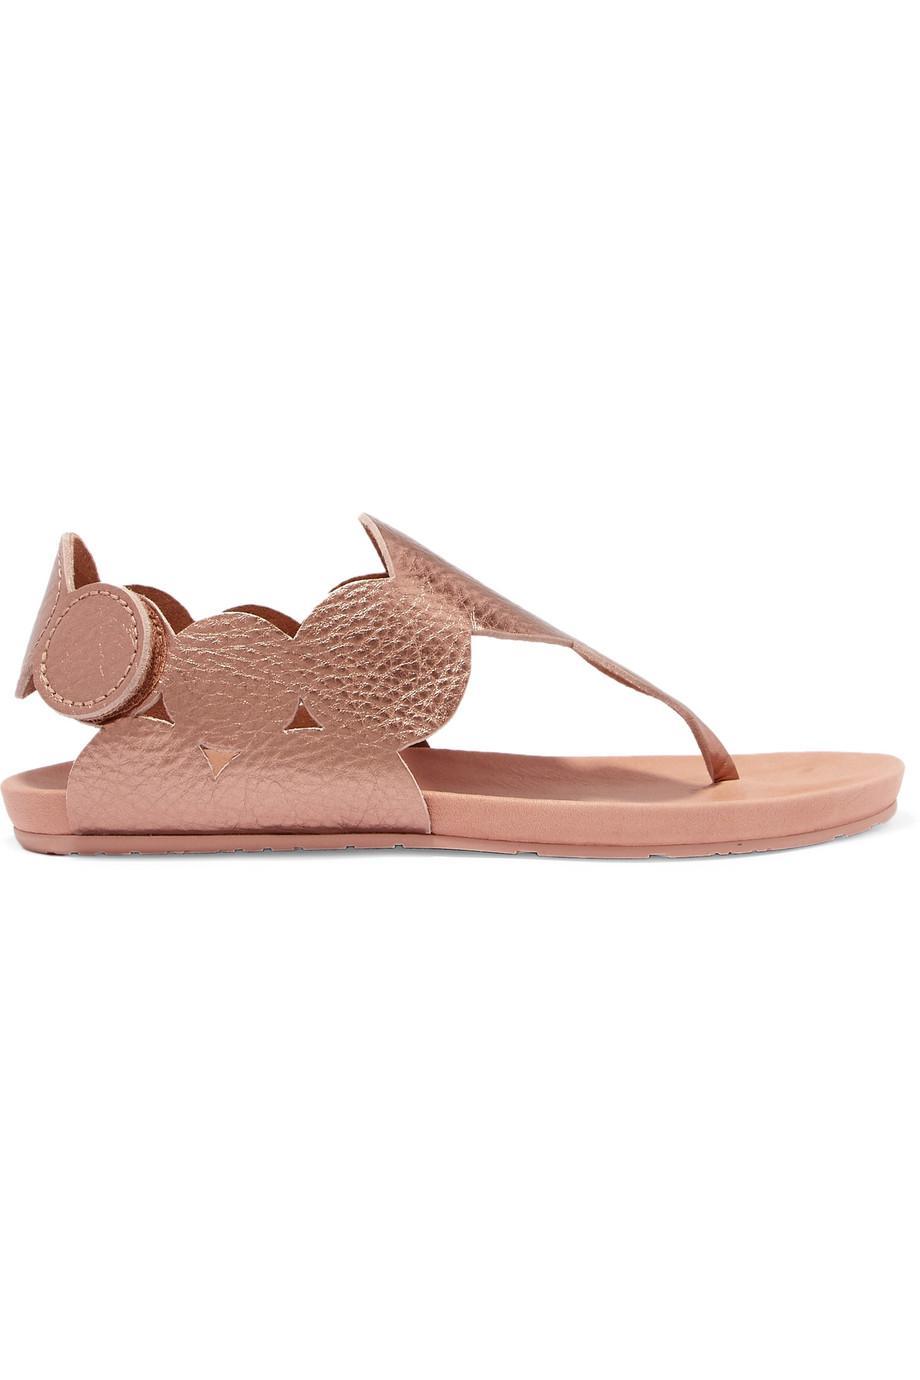 Pedro Garcia Jamee Metallic Textured-leather Sandals Discount View mRcVK8PRh